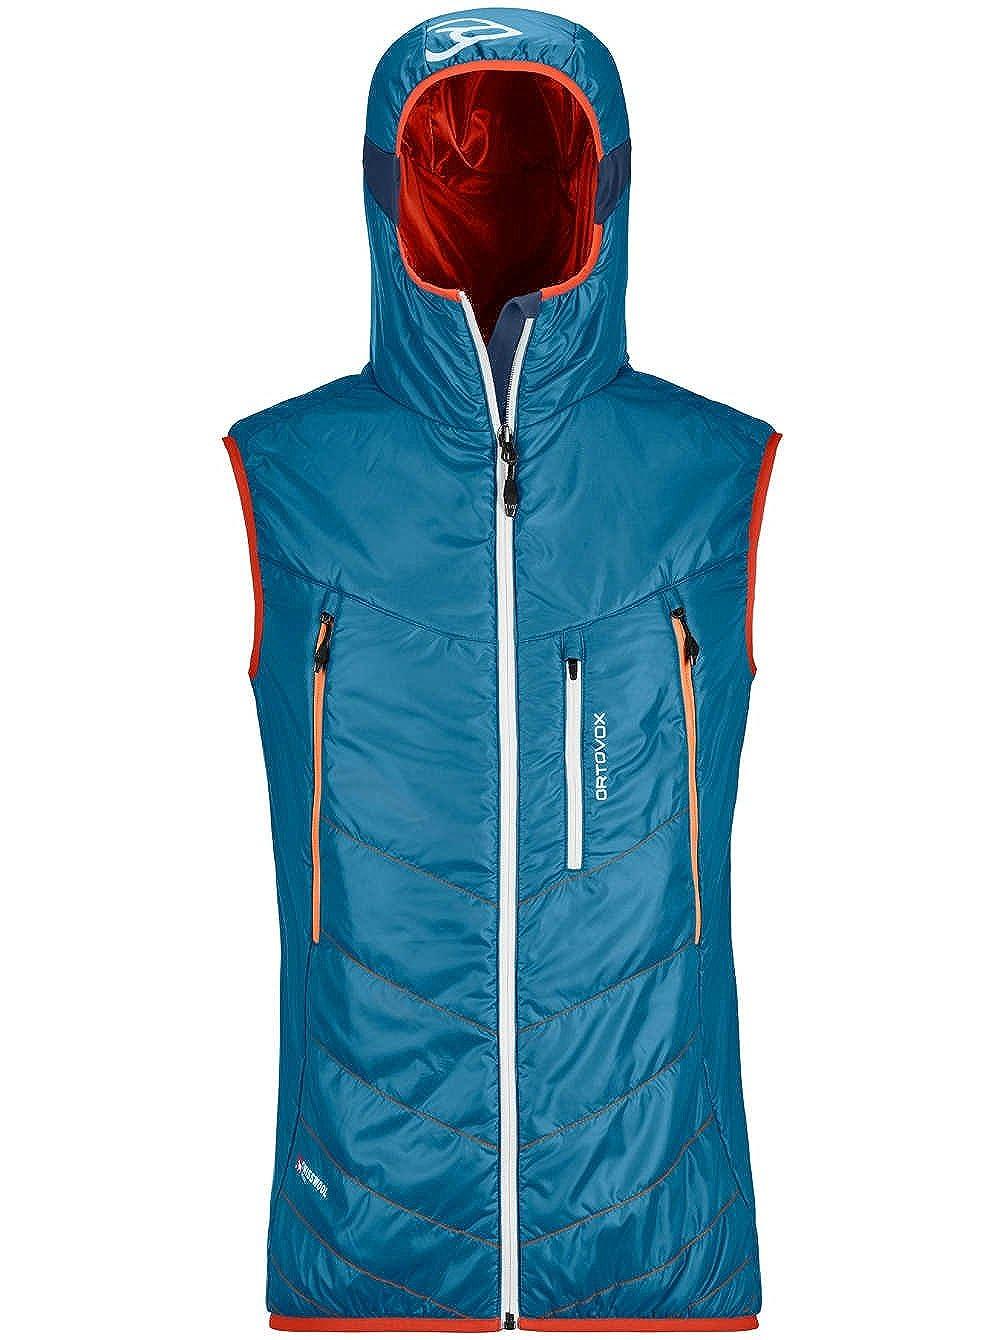 Ortovox Merino Guardian Shell Jacket Men, night blue